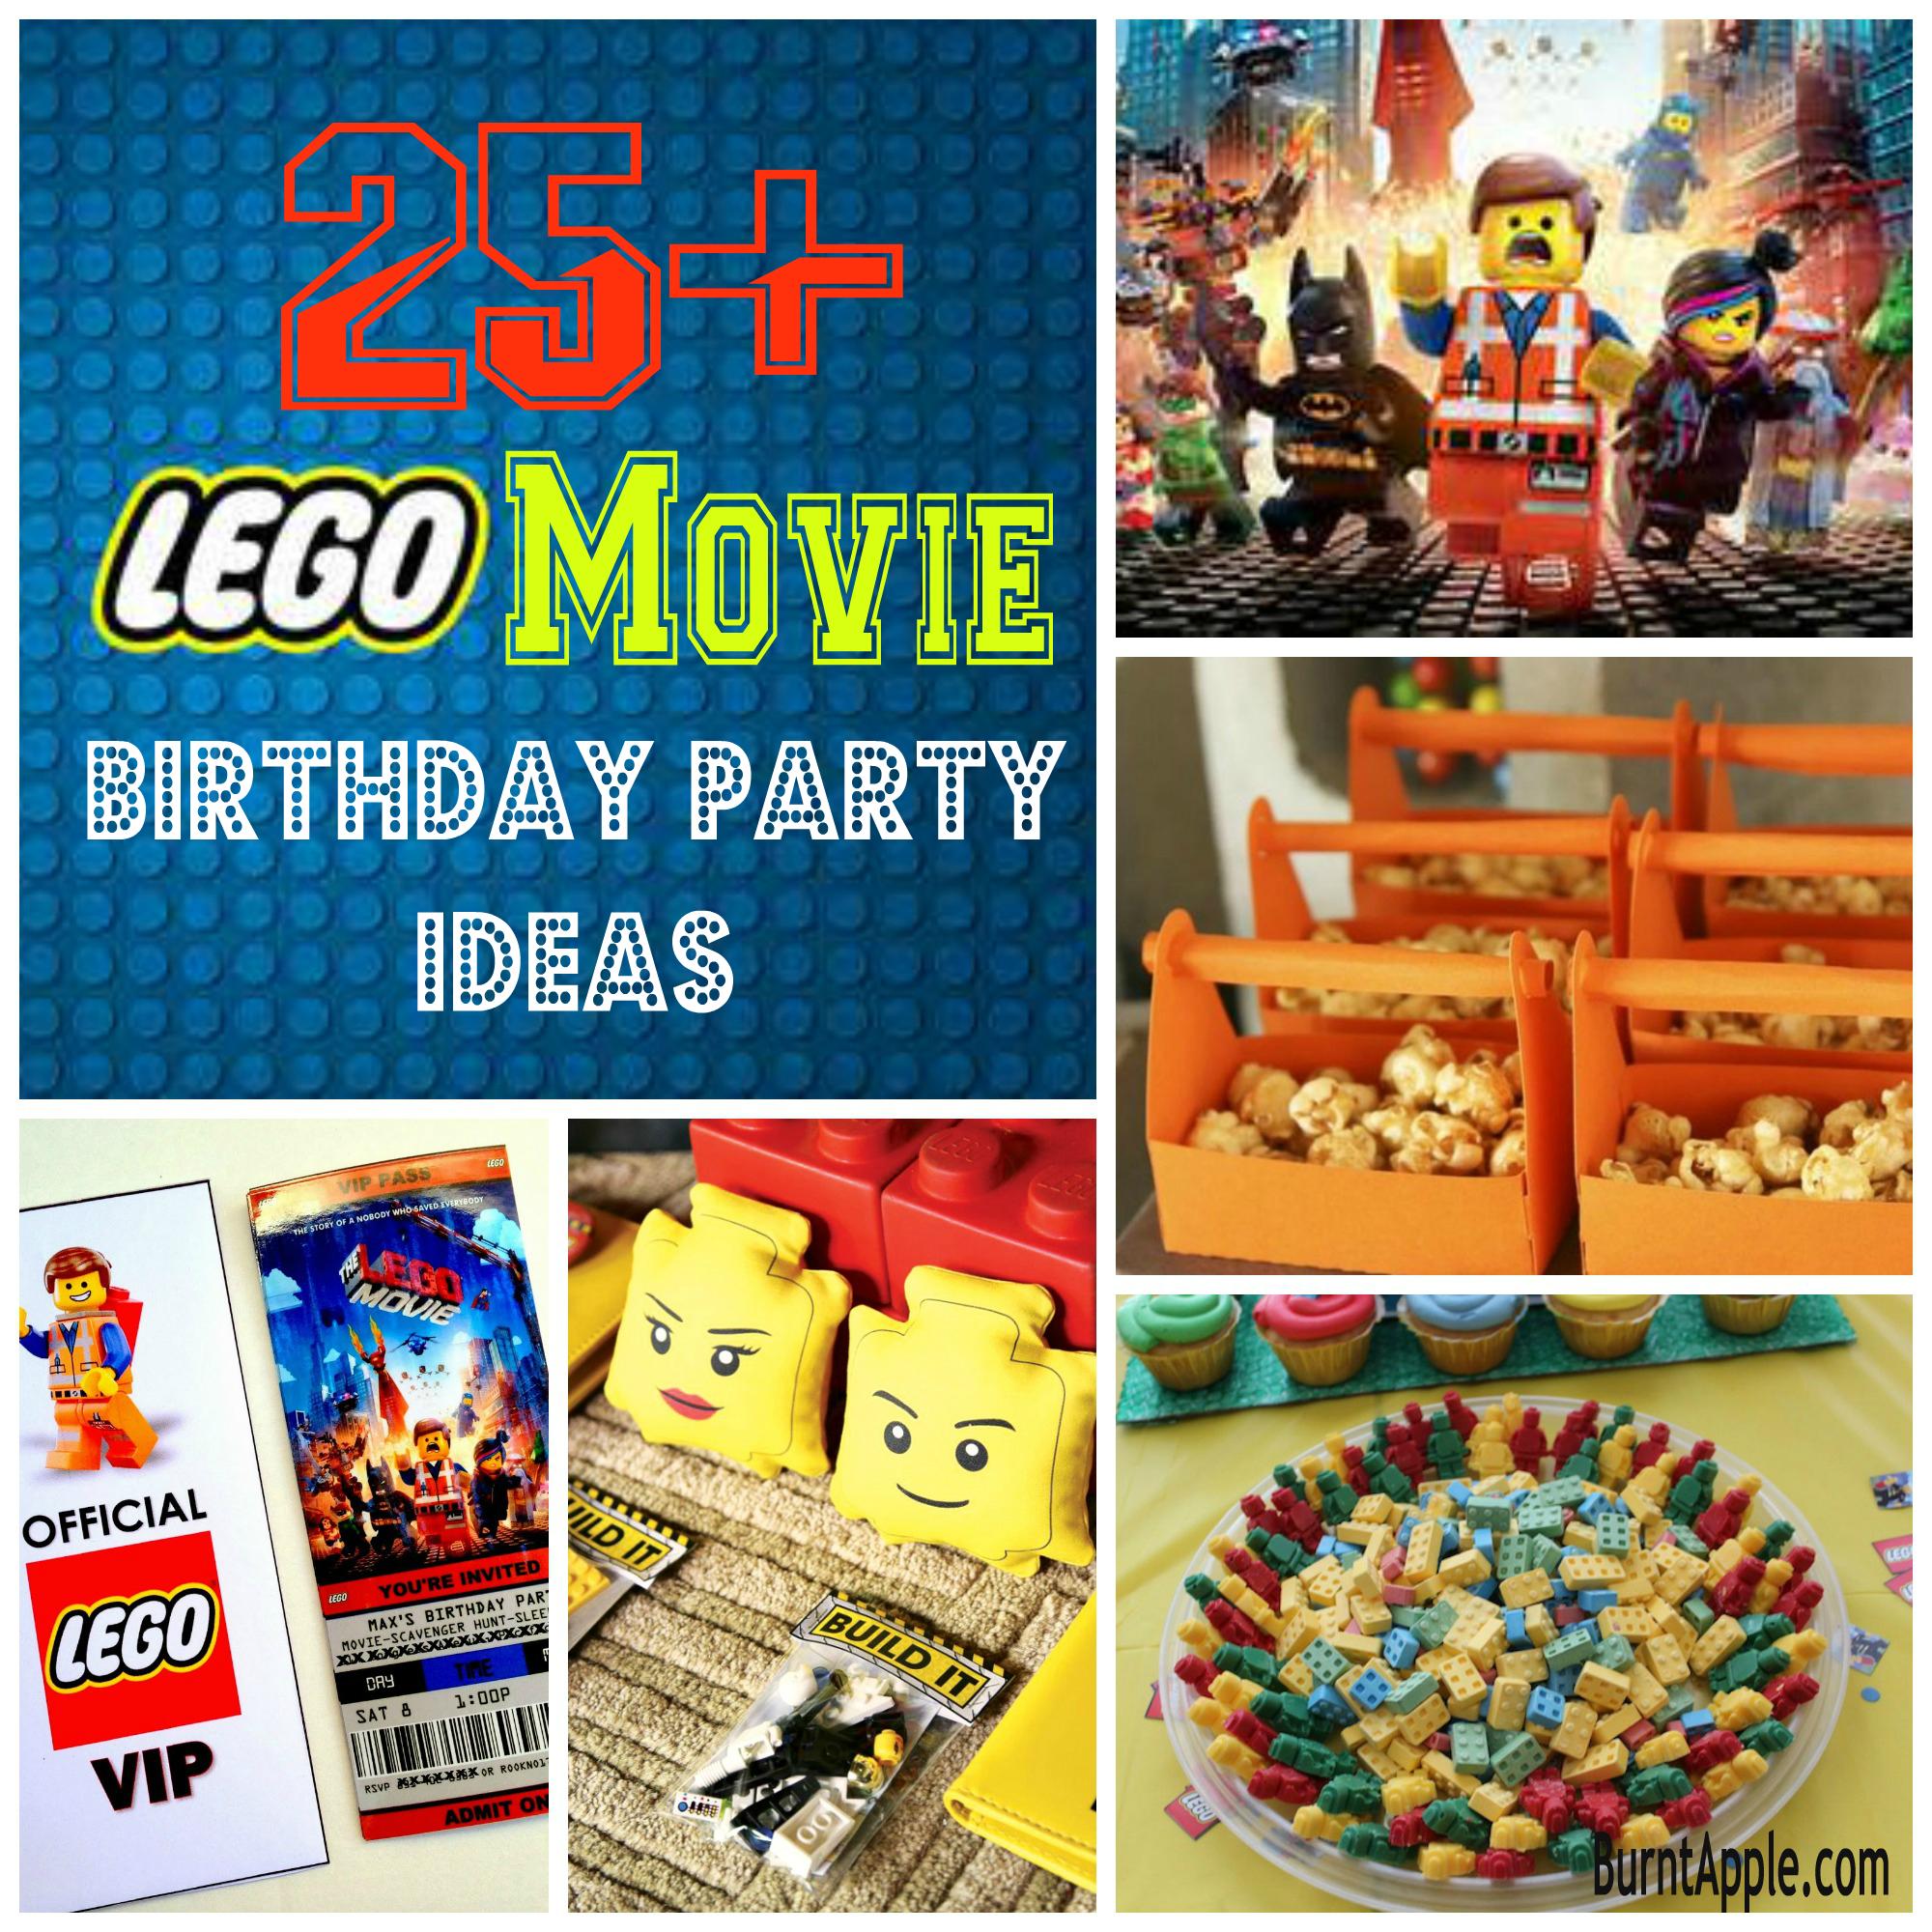 25 Lego Movie Birthday Party Ideas Burnt Apple